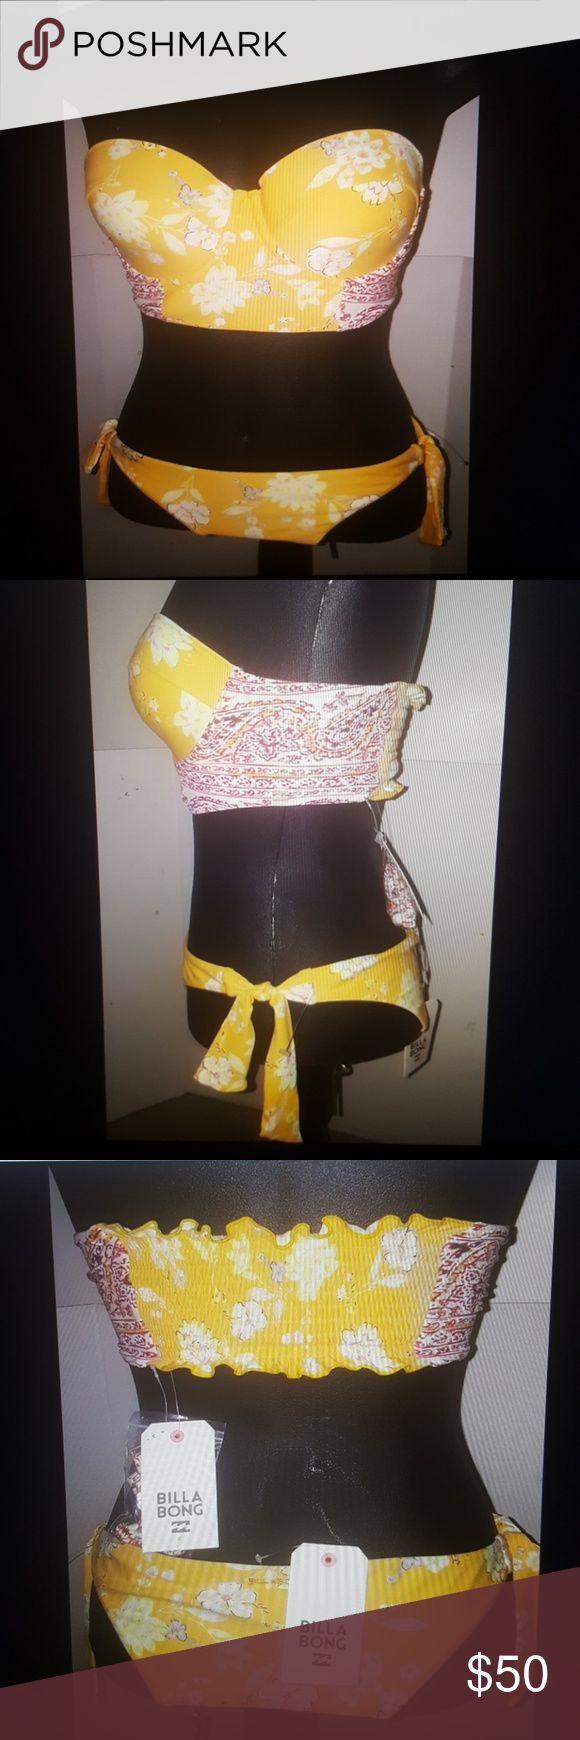 BillaBong bikini yellow large new BillaBong 2 piece bikini yellow floral pattern skimpy bottoms tie side halter top  large new Billabong Swim Bikinis